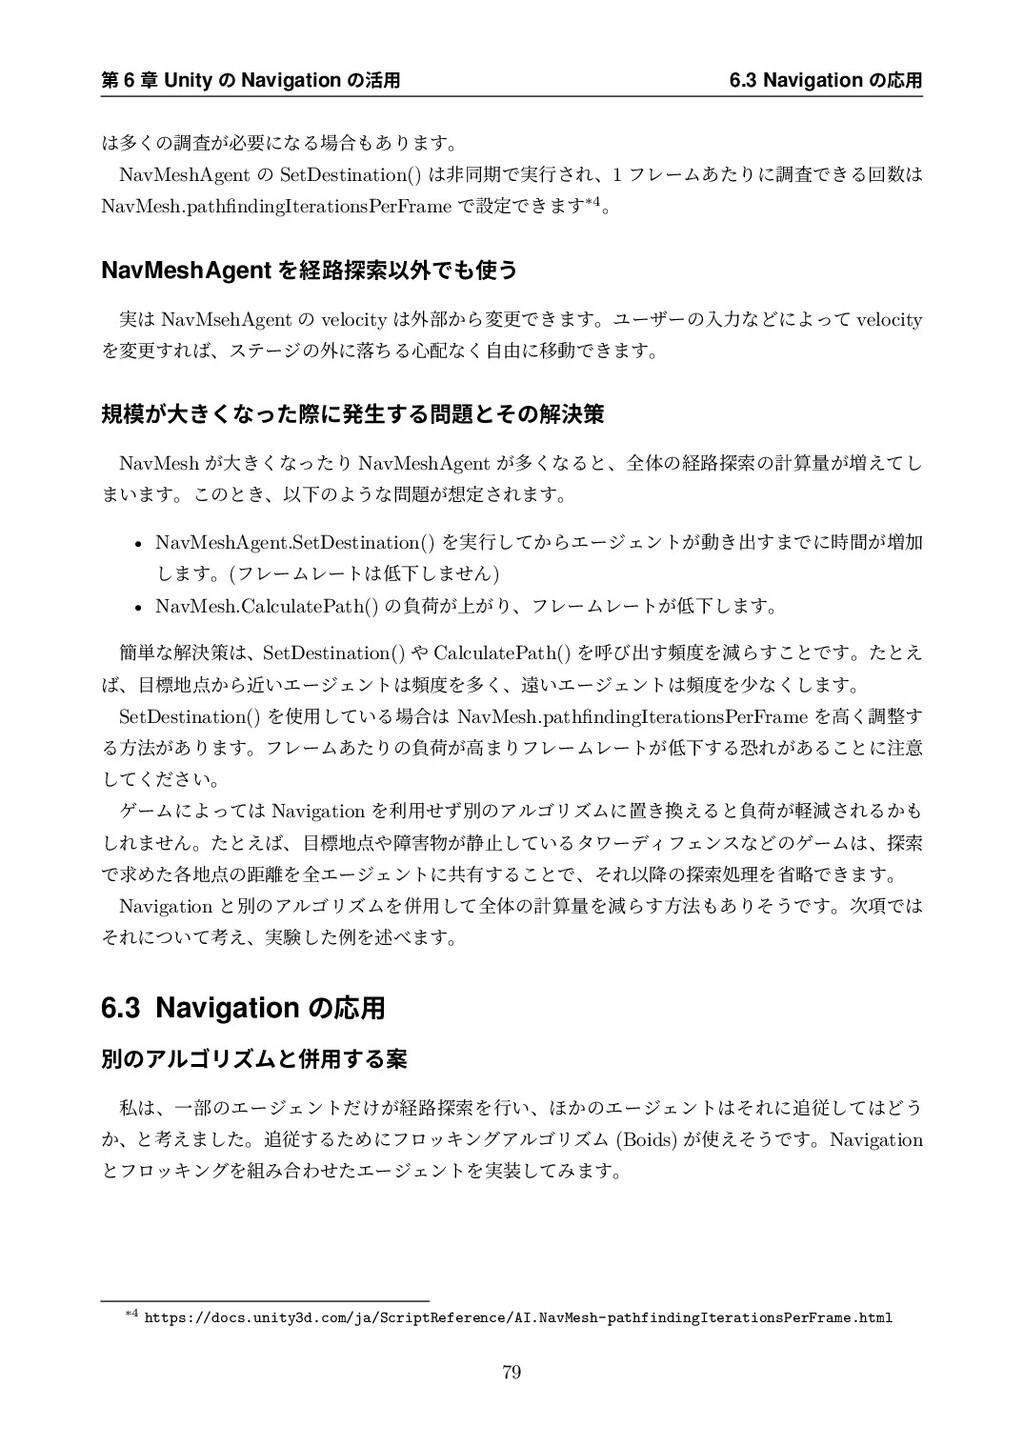 ୈ 6 ষ Unity ͷ Navigation ͷ׆༻ 6.3 Navigation ͷԠ༻...